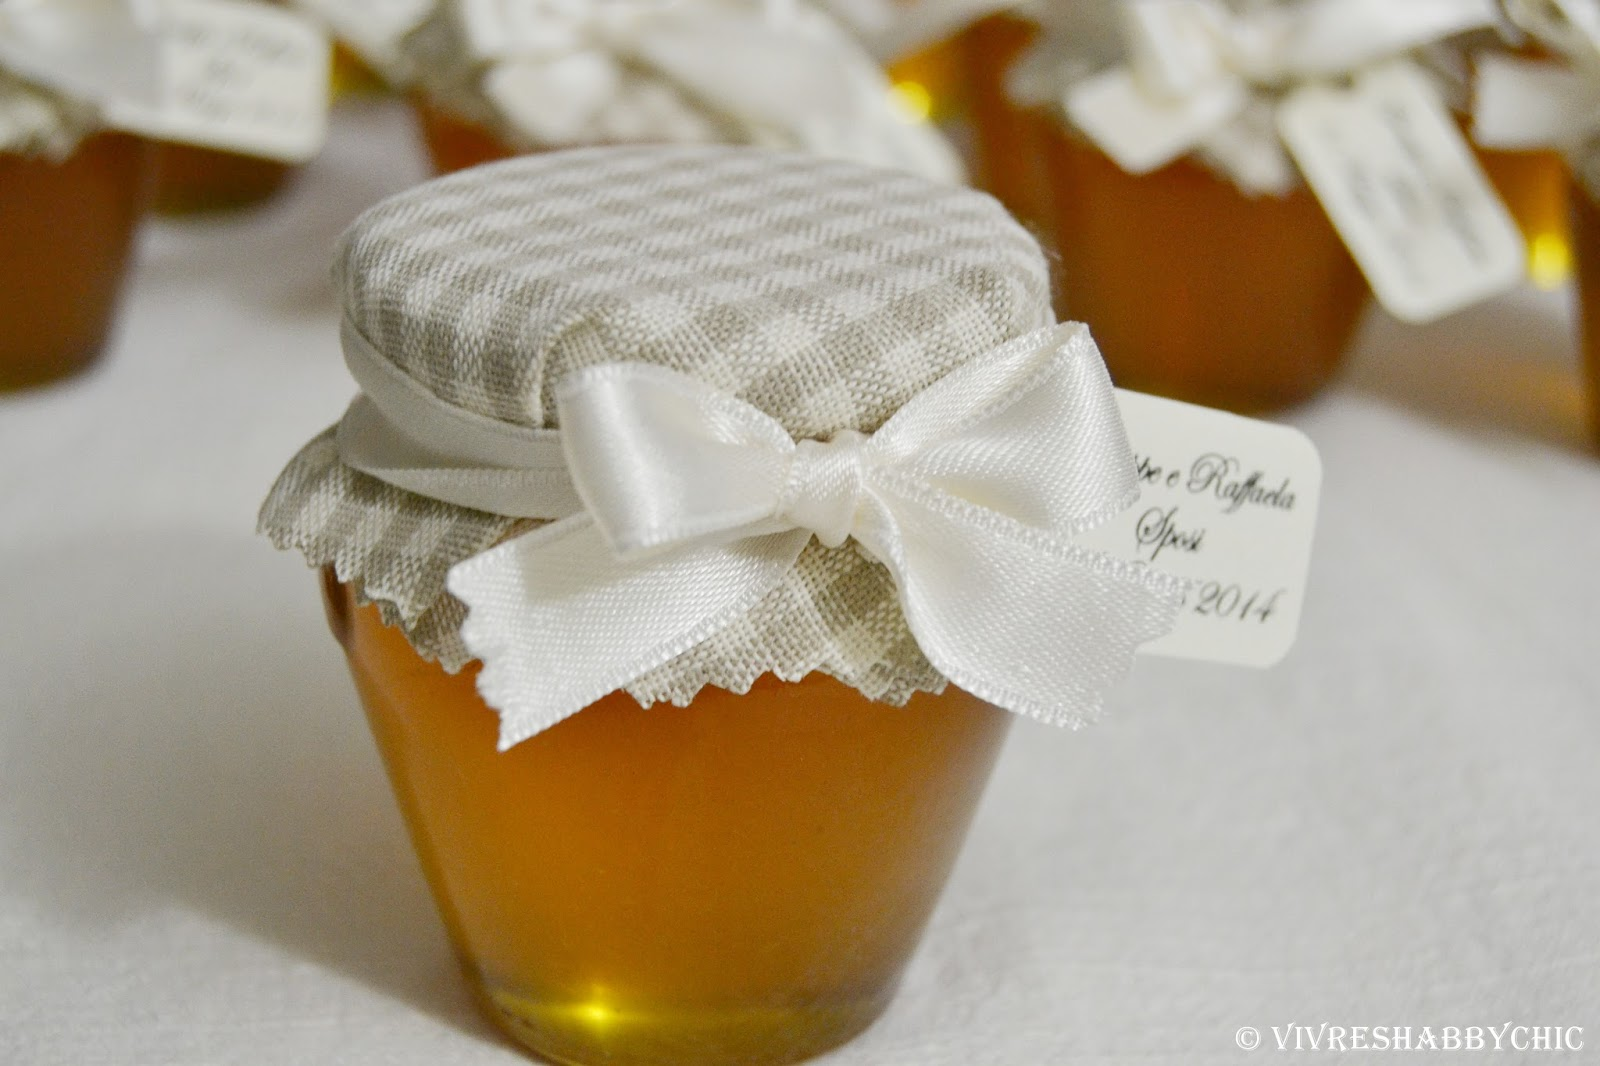 miele-bomboniera-matrimonio-copricoperchio-nastrino-bianco